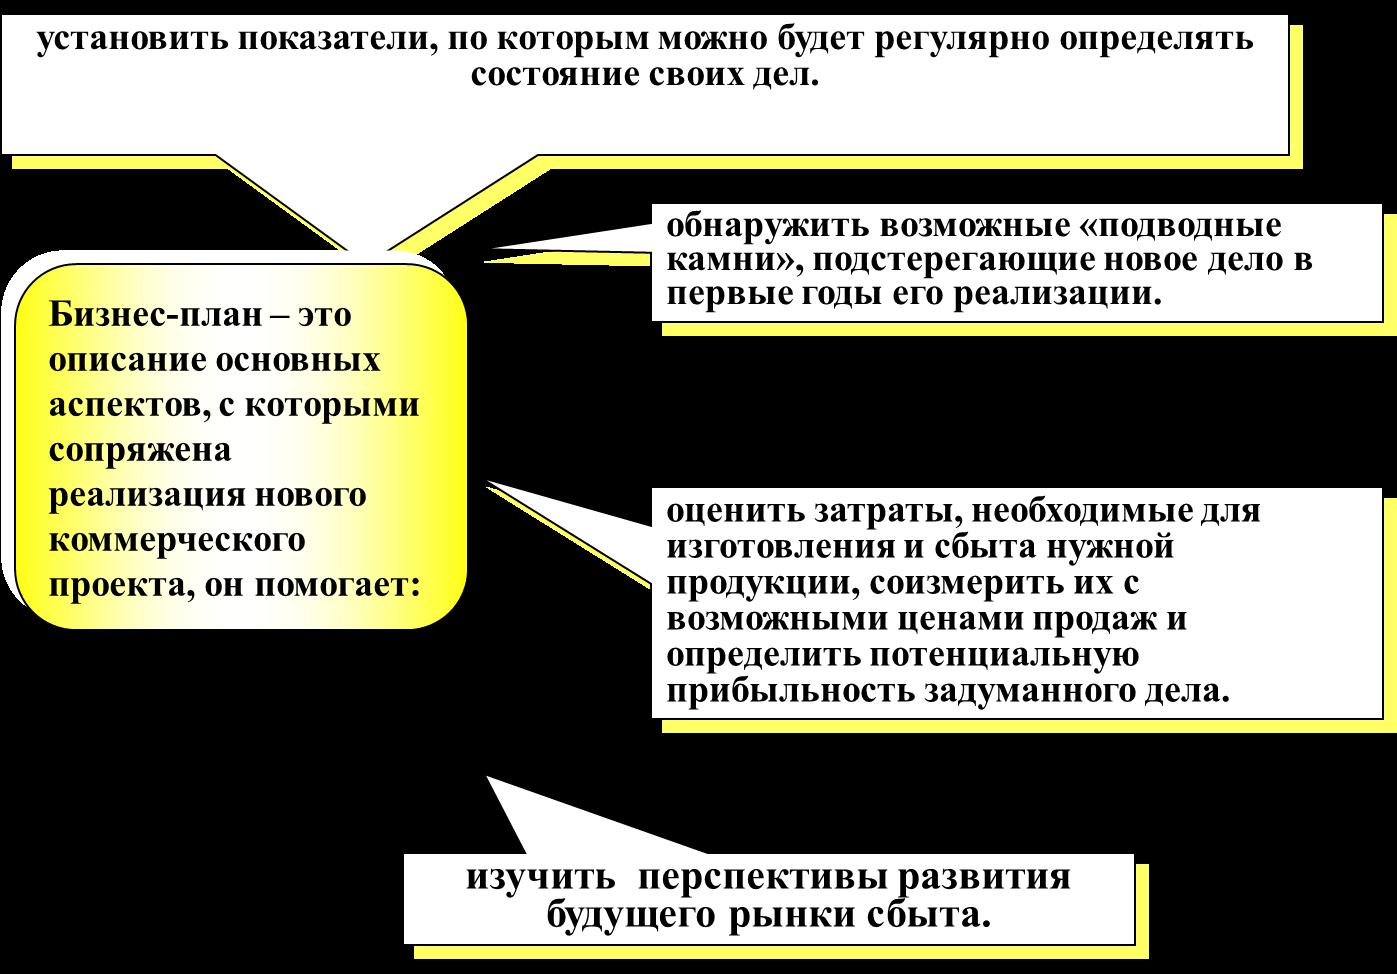 презентация бизнес планпо общесвознанию